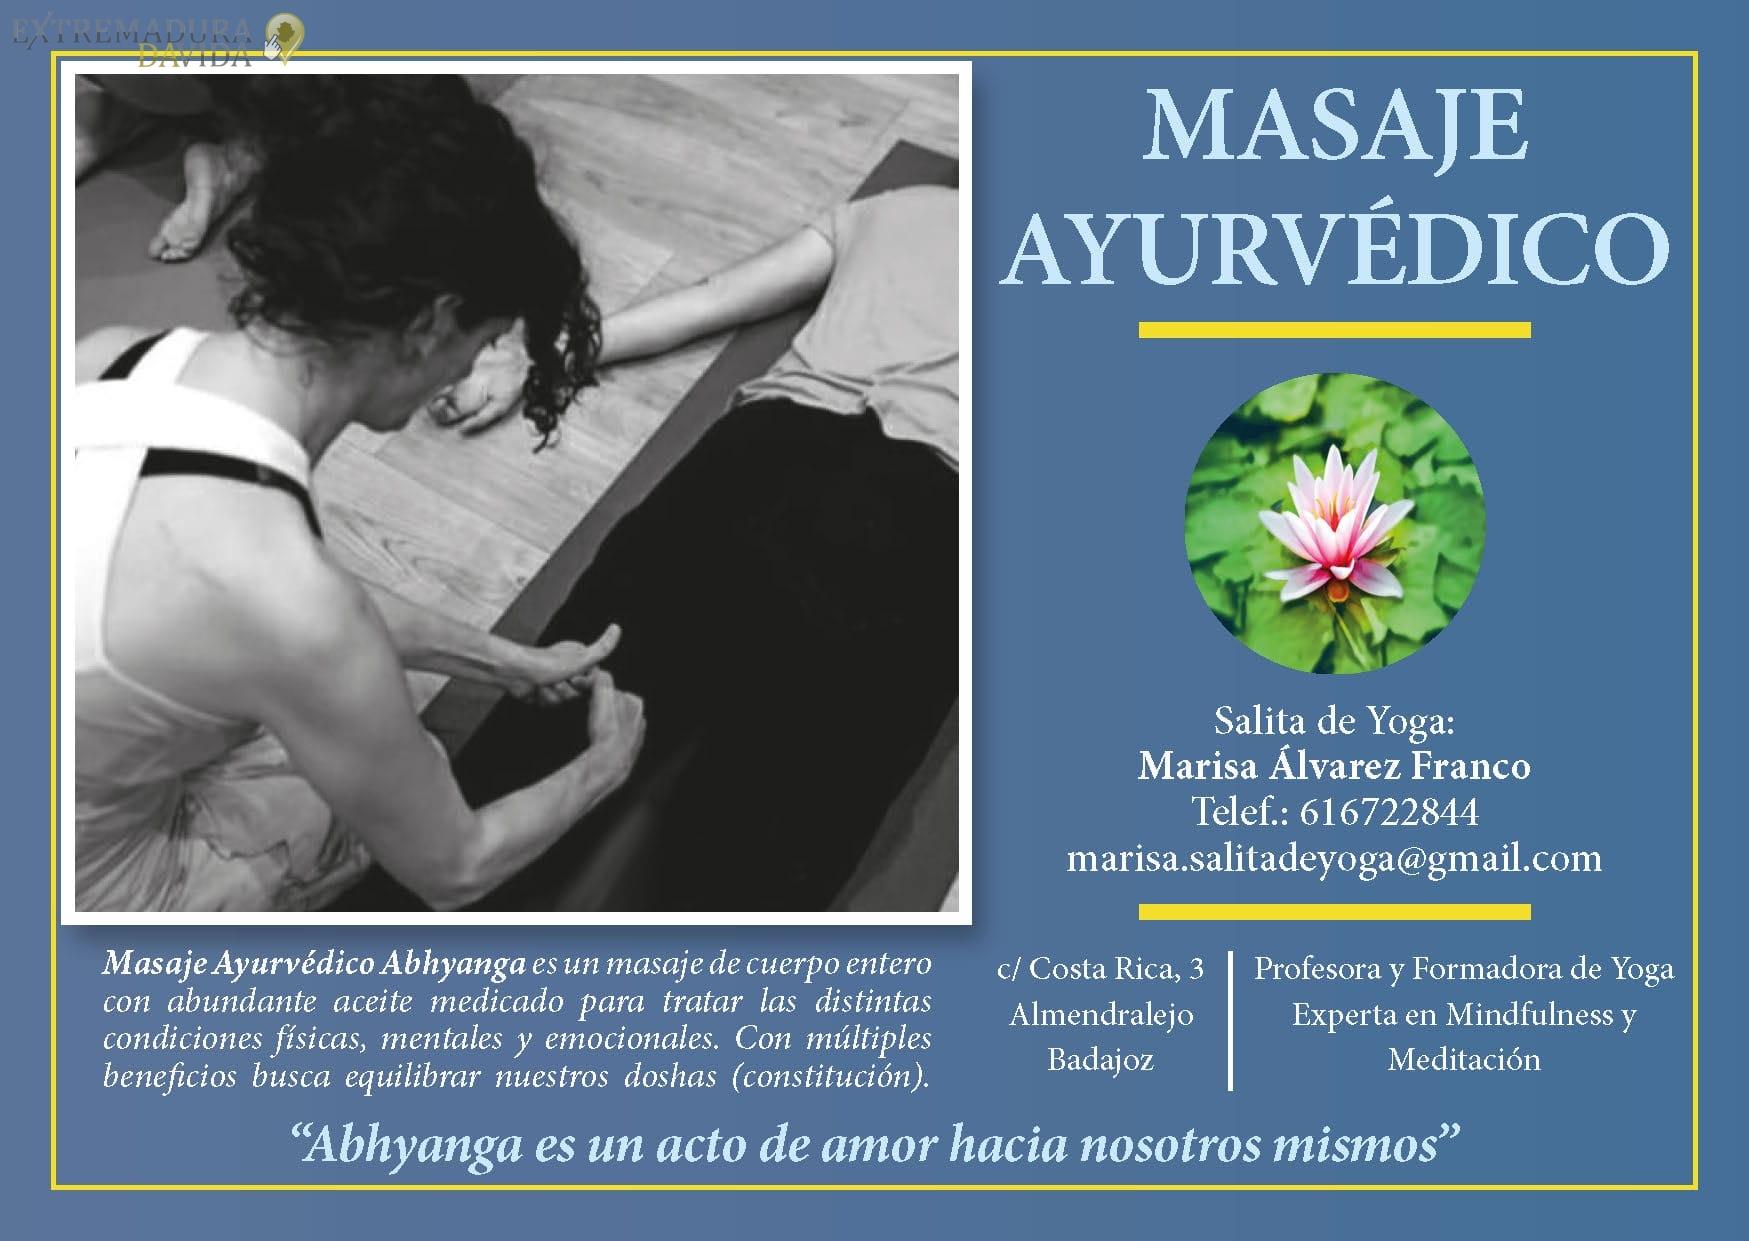 Ayurveda masajes en Almendralejo La Salita del Yoga